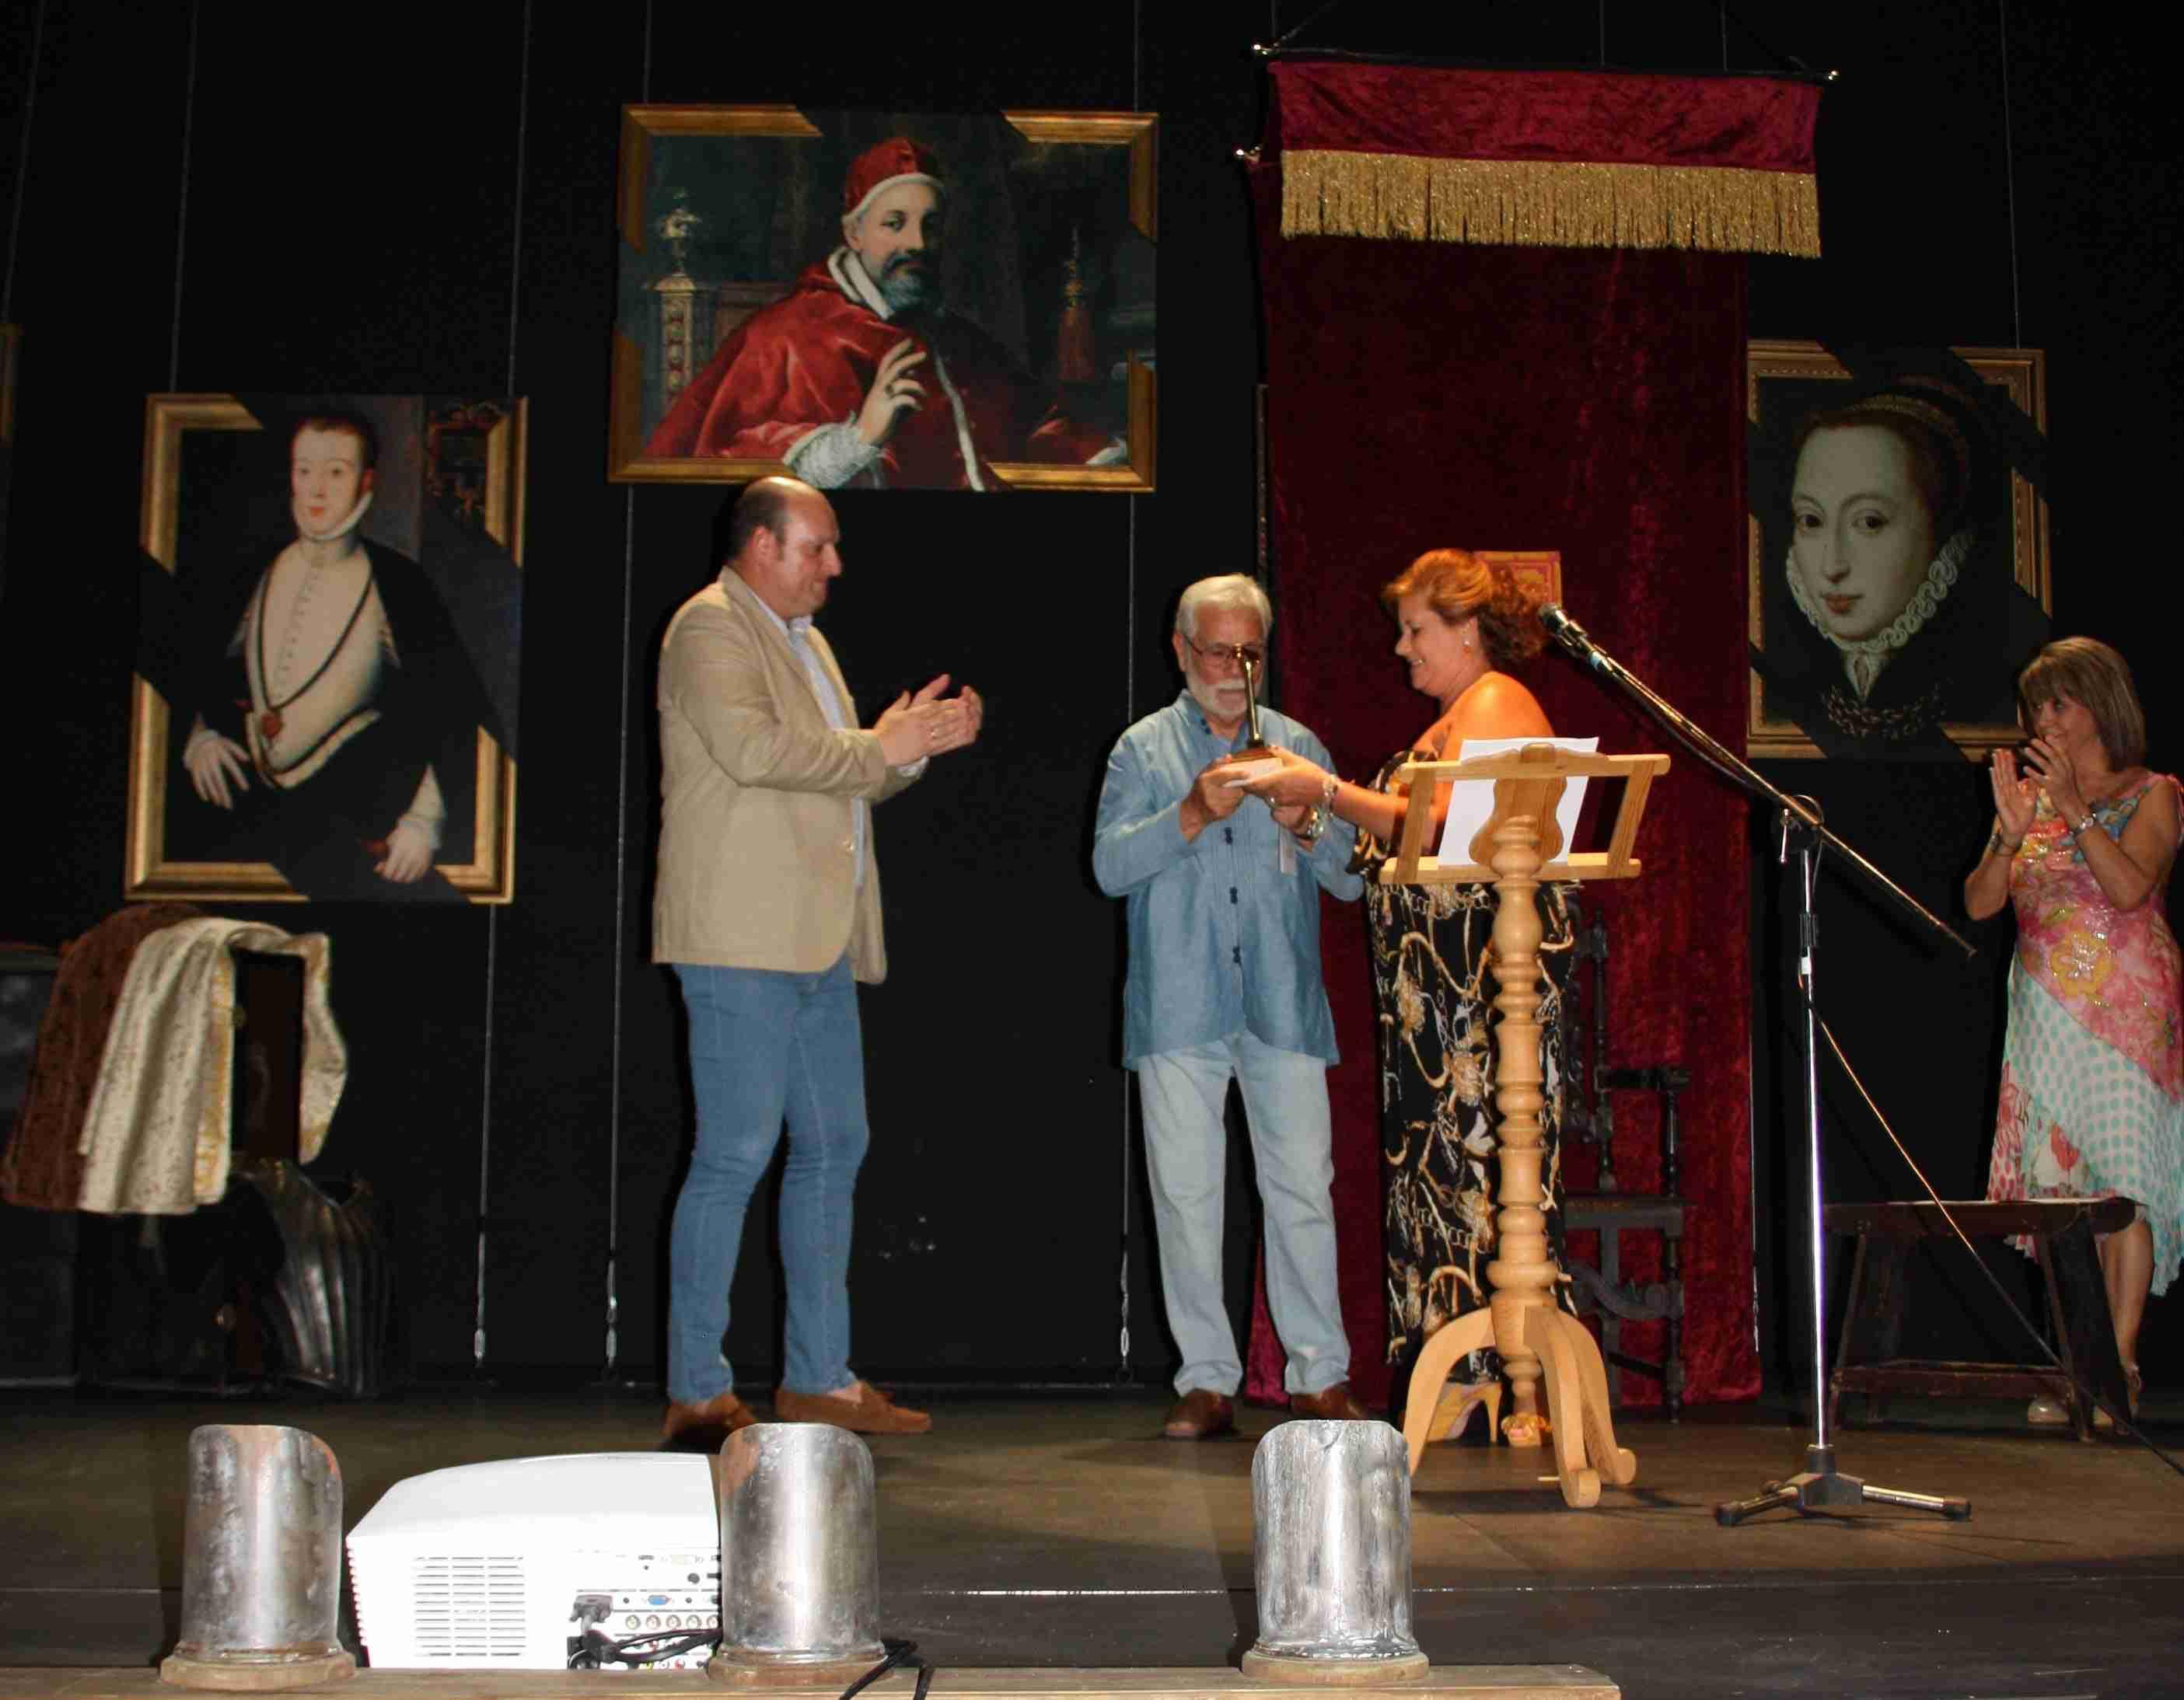 Merecido homenaje a Manuel Canseco, en el 9º Festival de Teatro y Títeres de Torralba de Calatrava 4